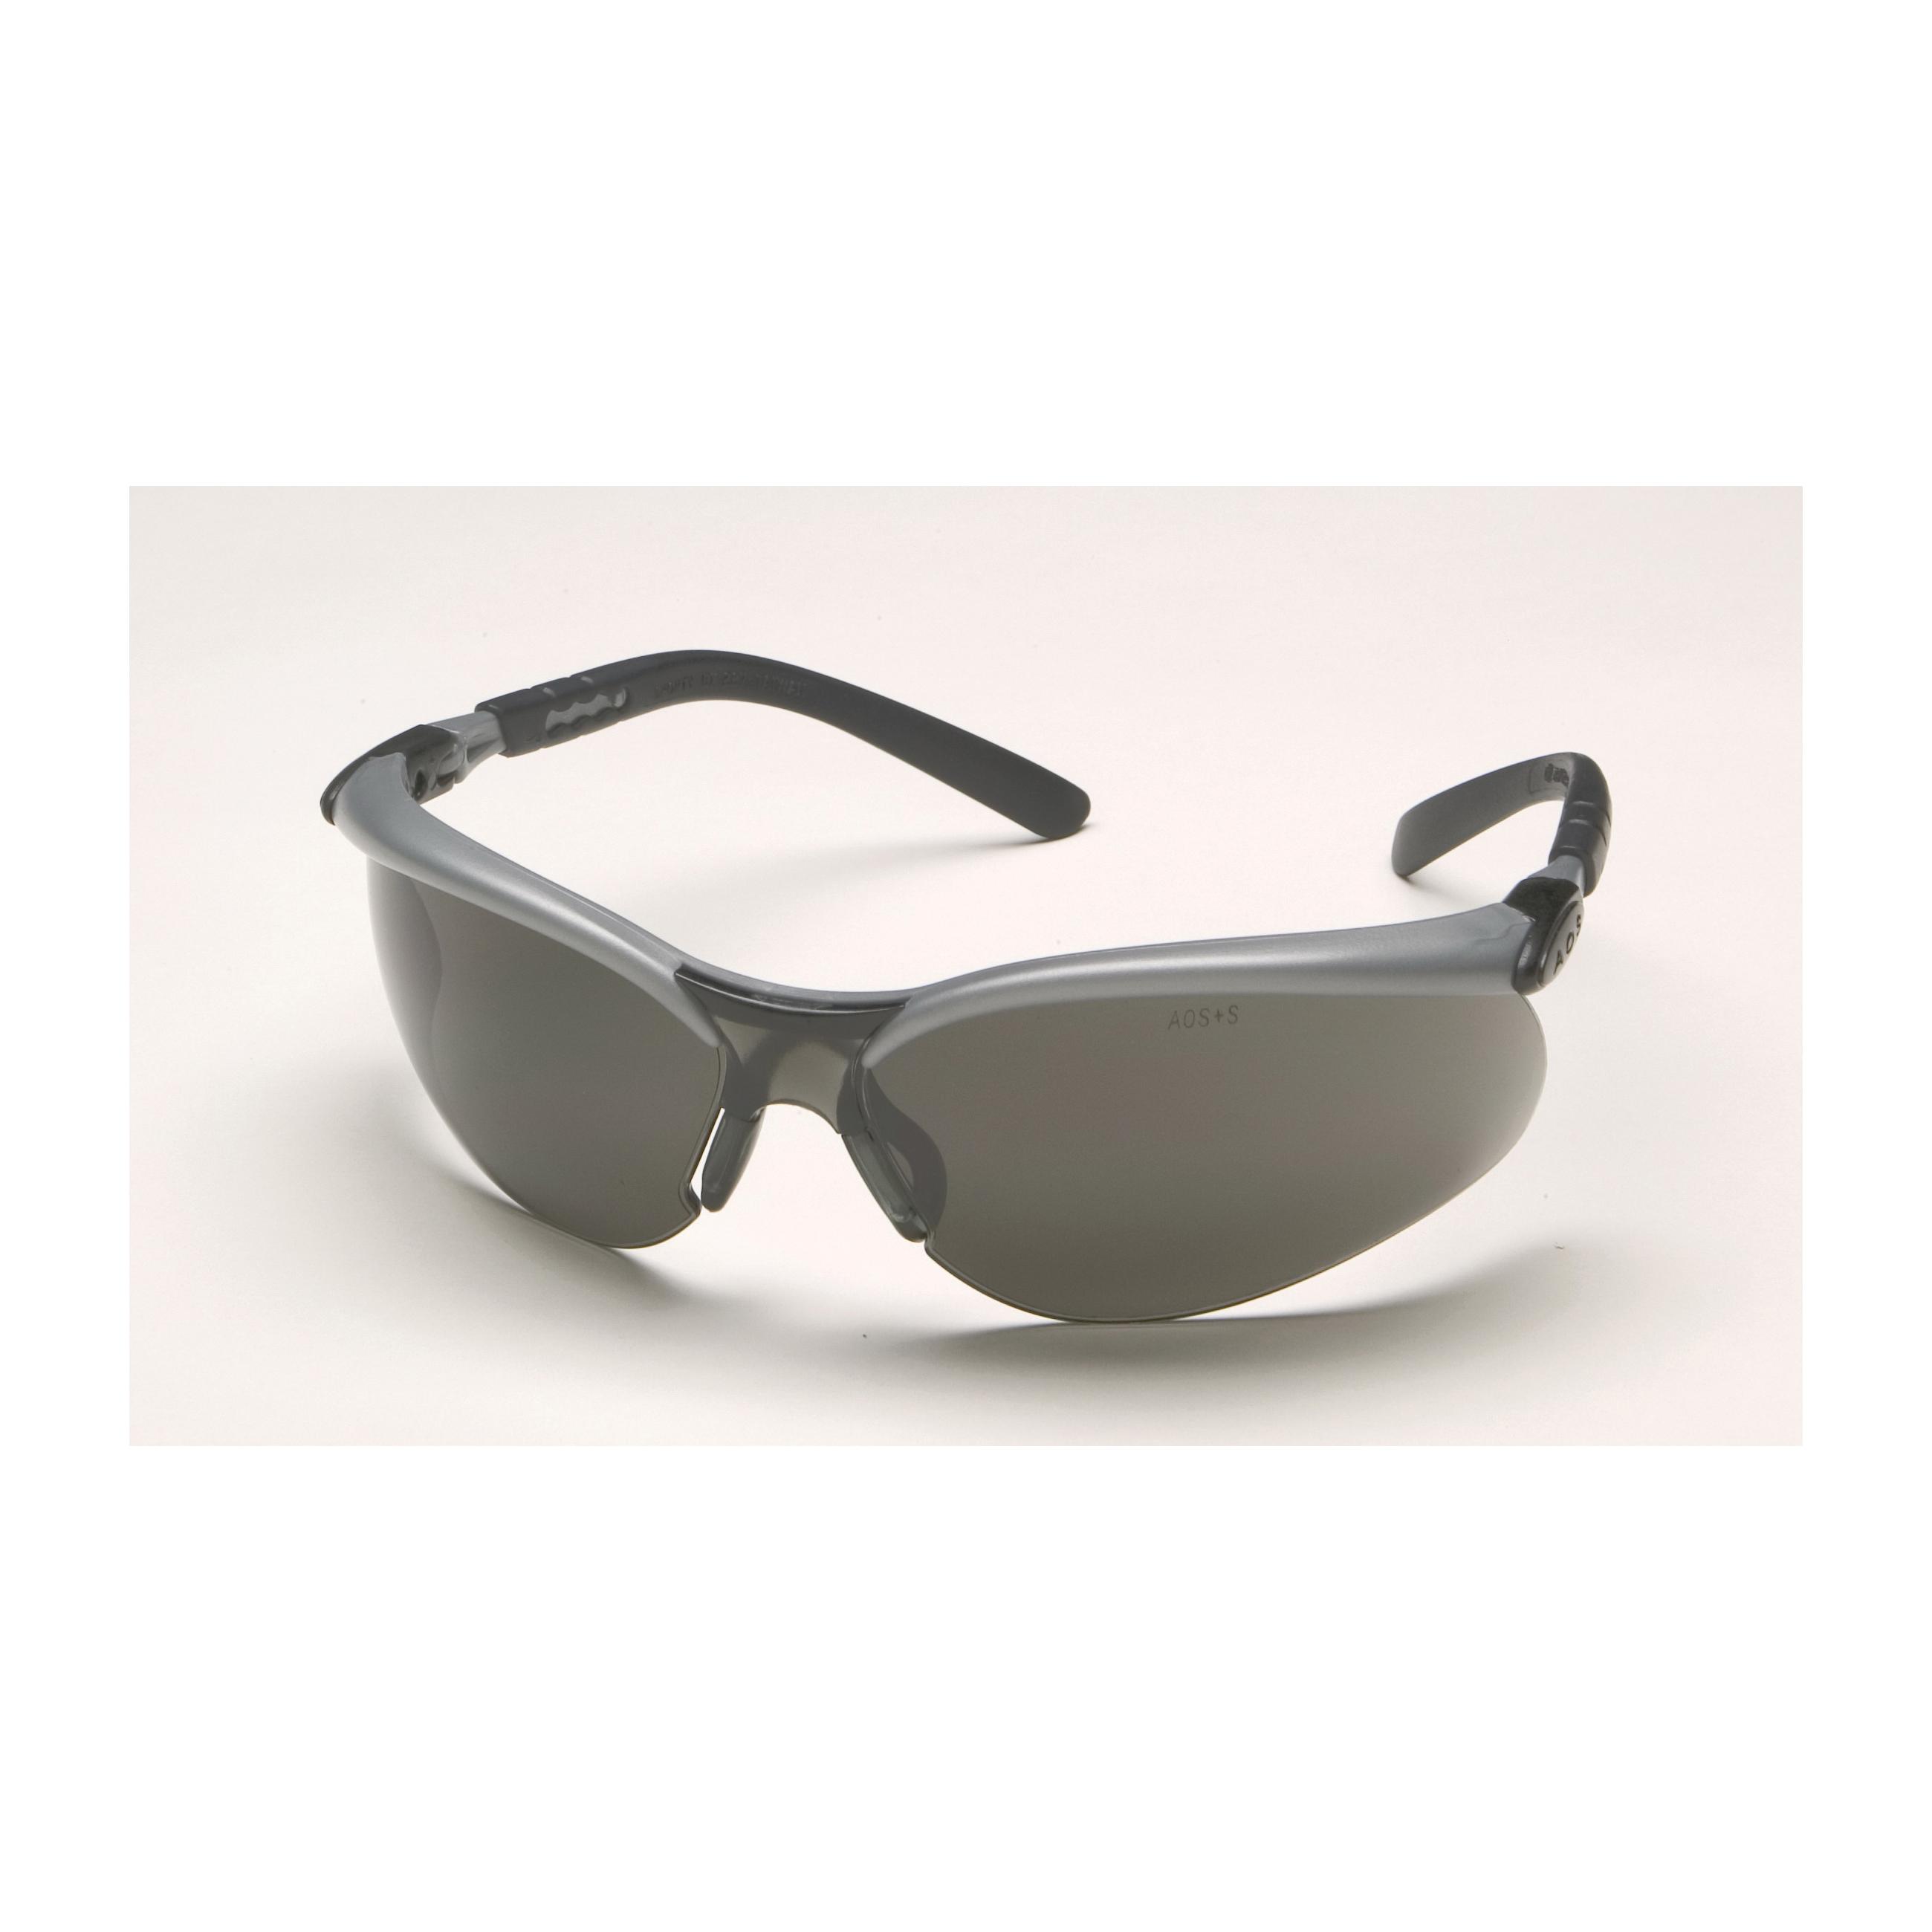 3M™ BX™ 078371-62053 11381-00000-20 Value Range Safety Glasses, Anti-Fog Gray Lens, Half Framed Black/Silver Plastic Frame, Polycarbonate Lens, Specifications Met: ANSI Z87.1, CSA Z94.3-2007